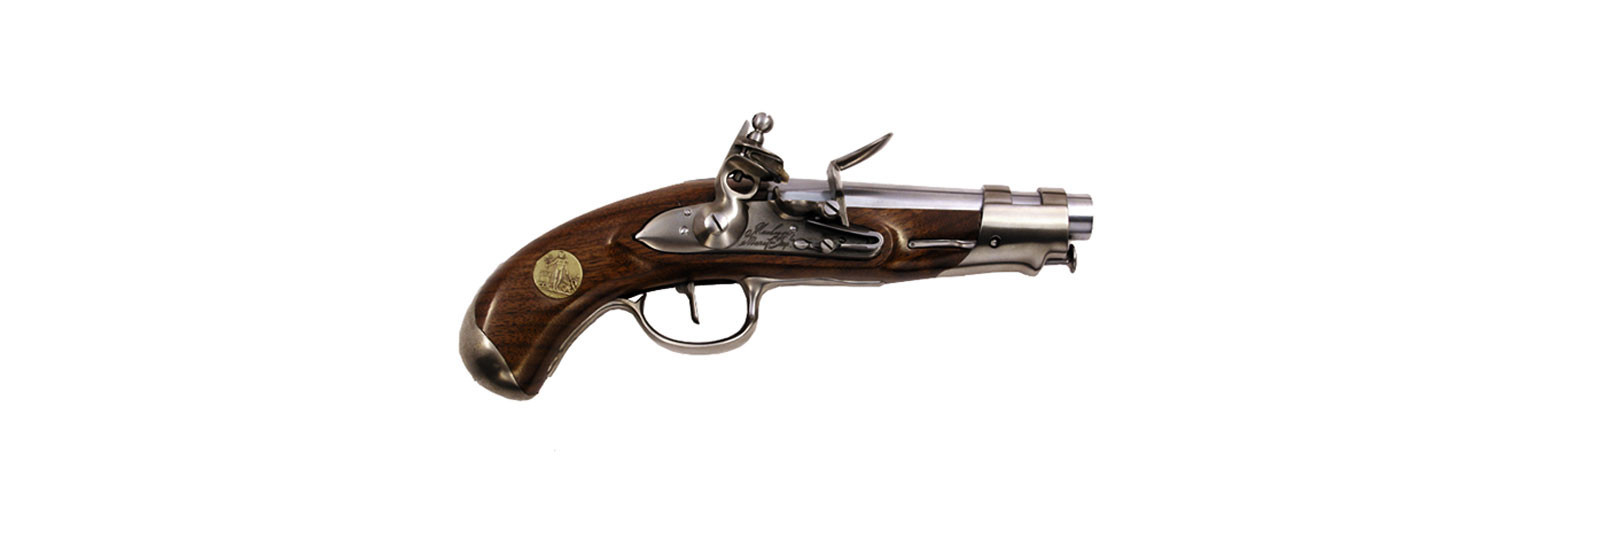 Anix gendarmerie comm. pistol 15,2mm